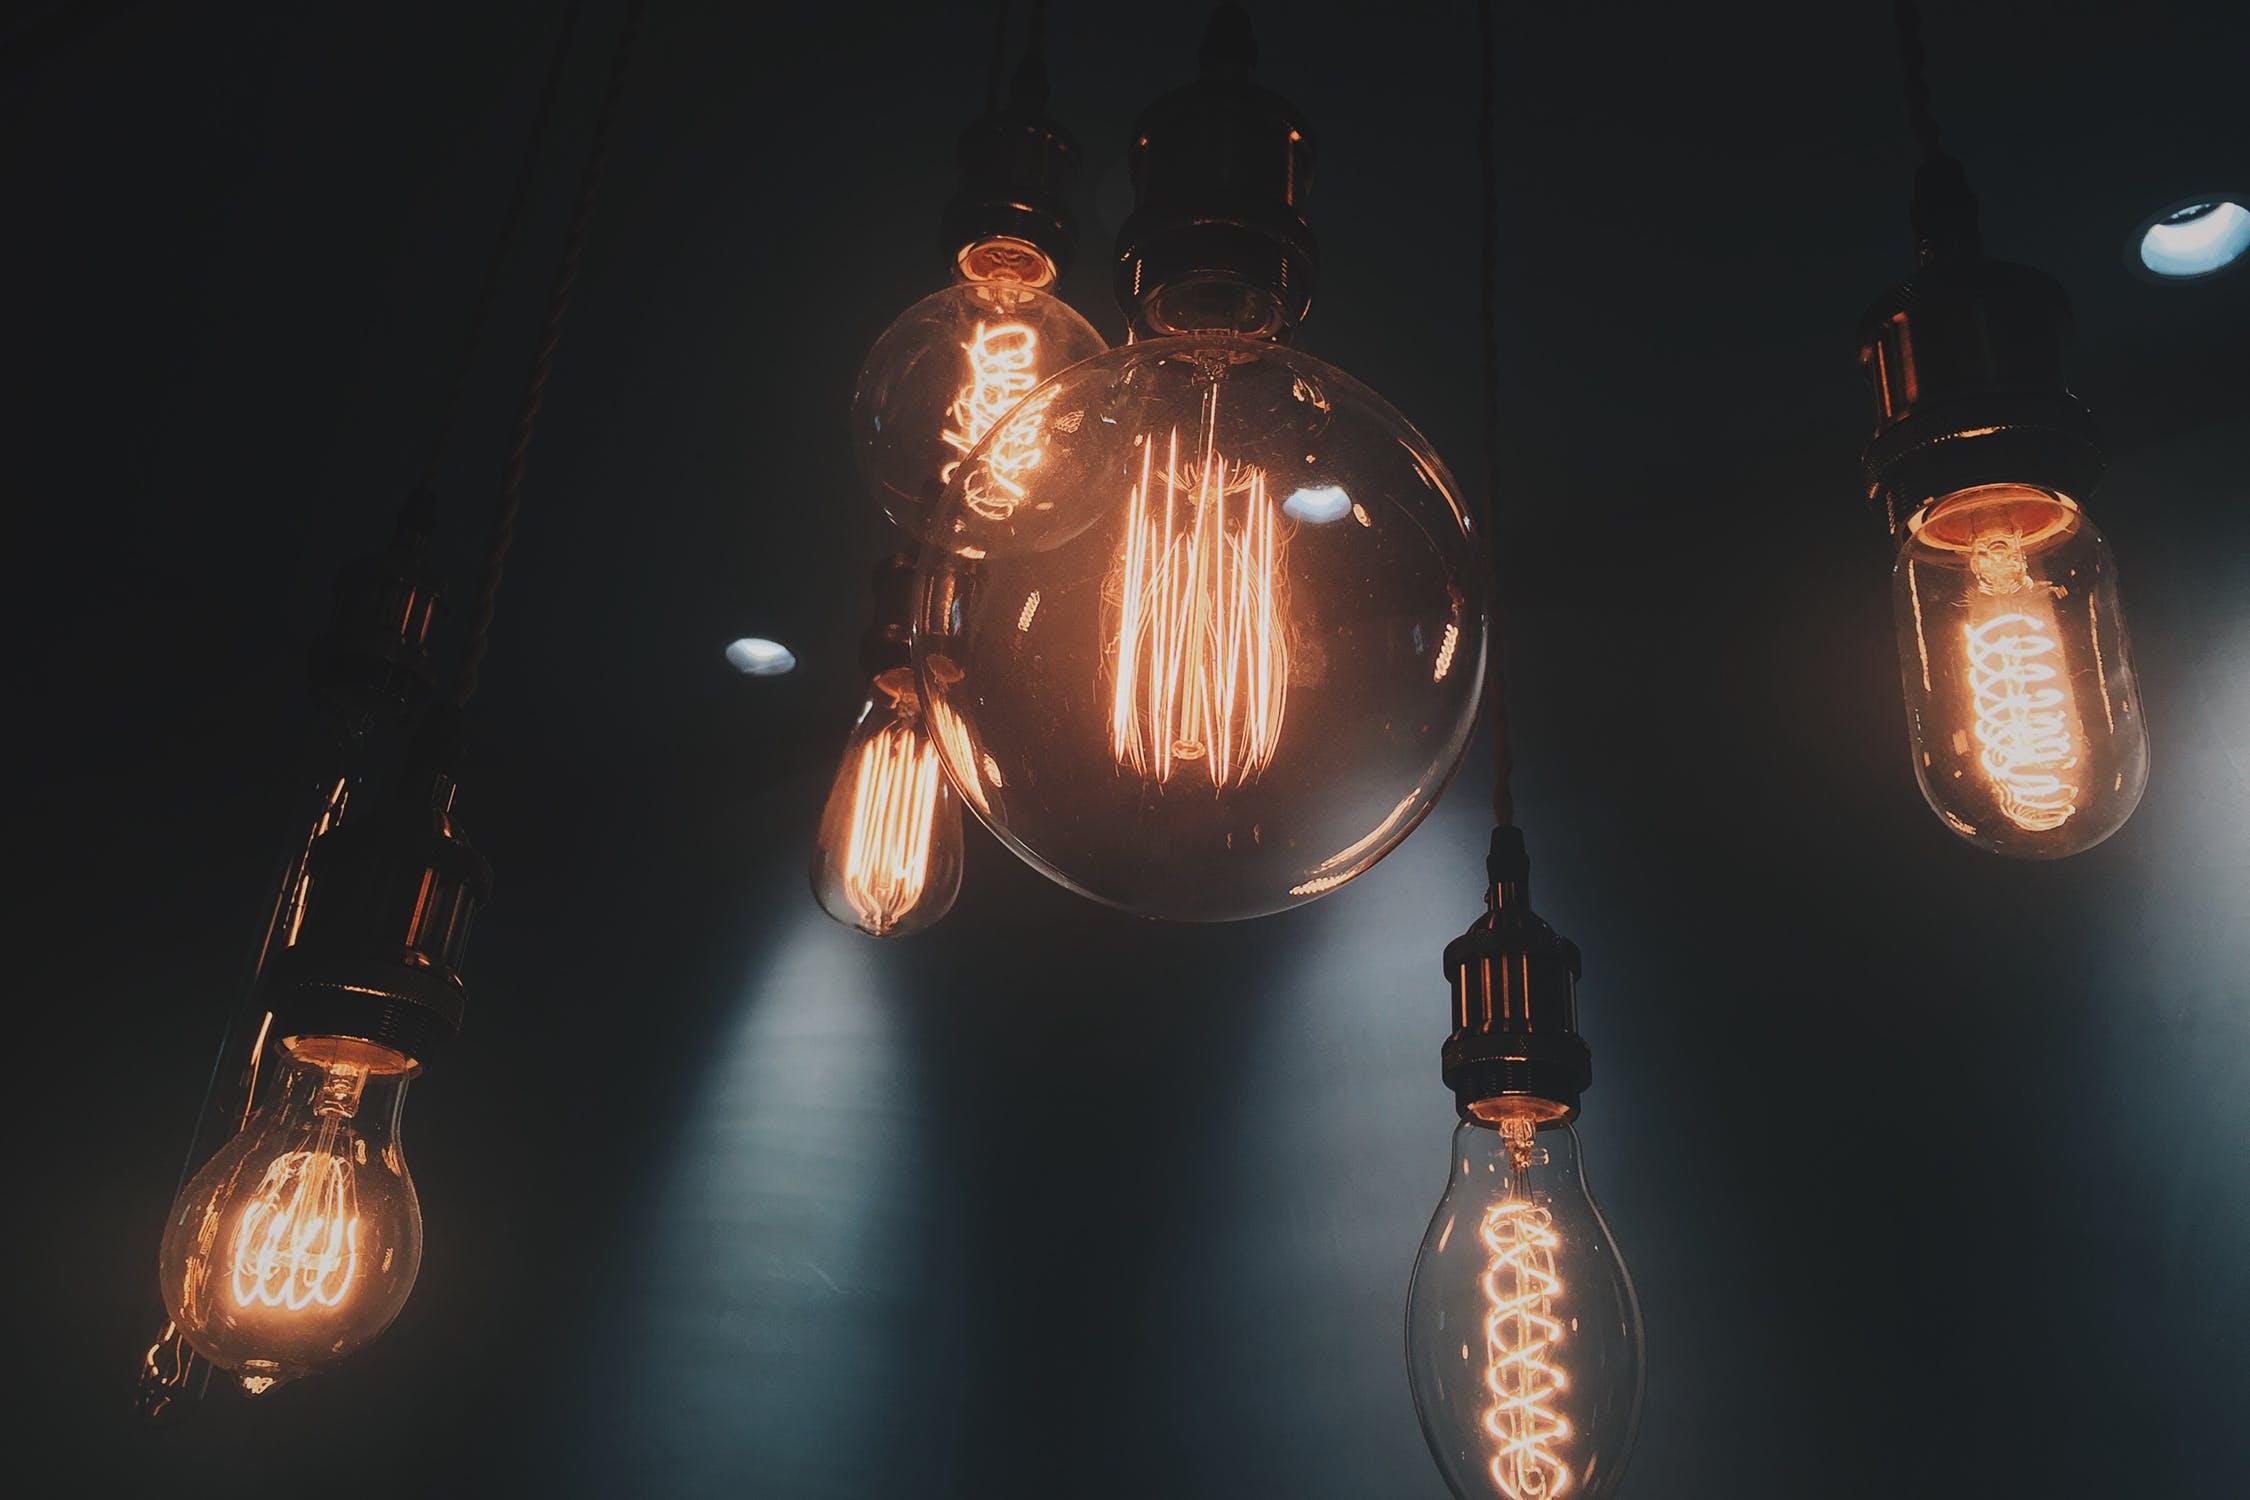 Hoeveel Watt is hoeveel Lumen?